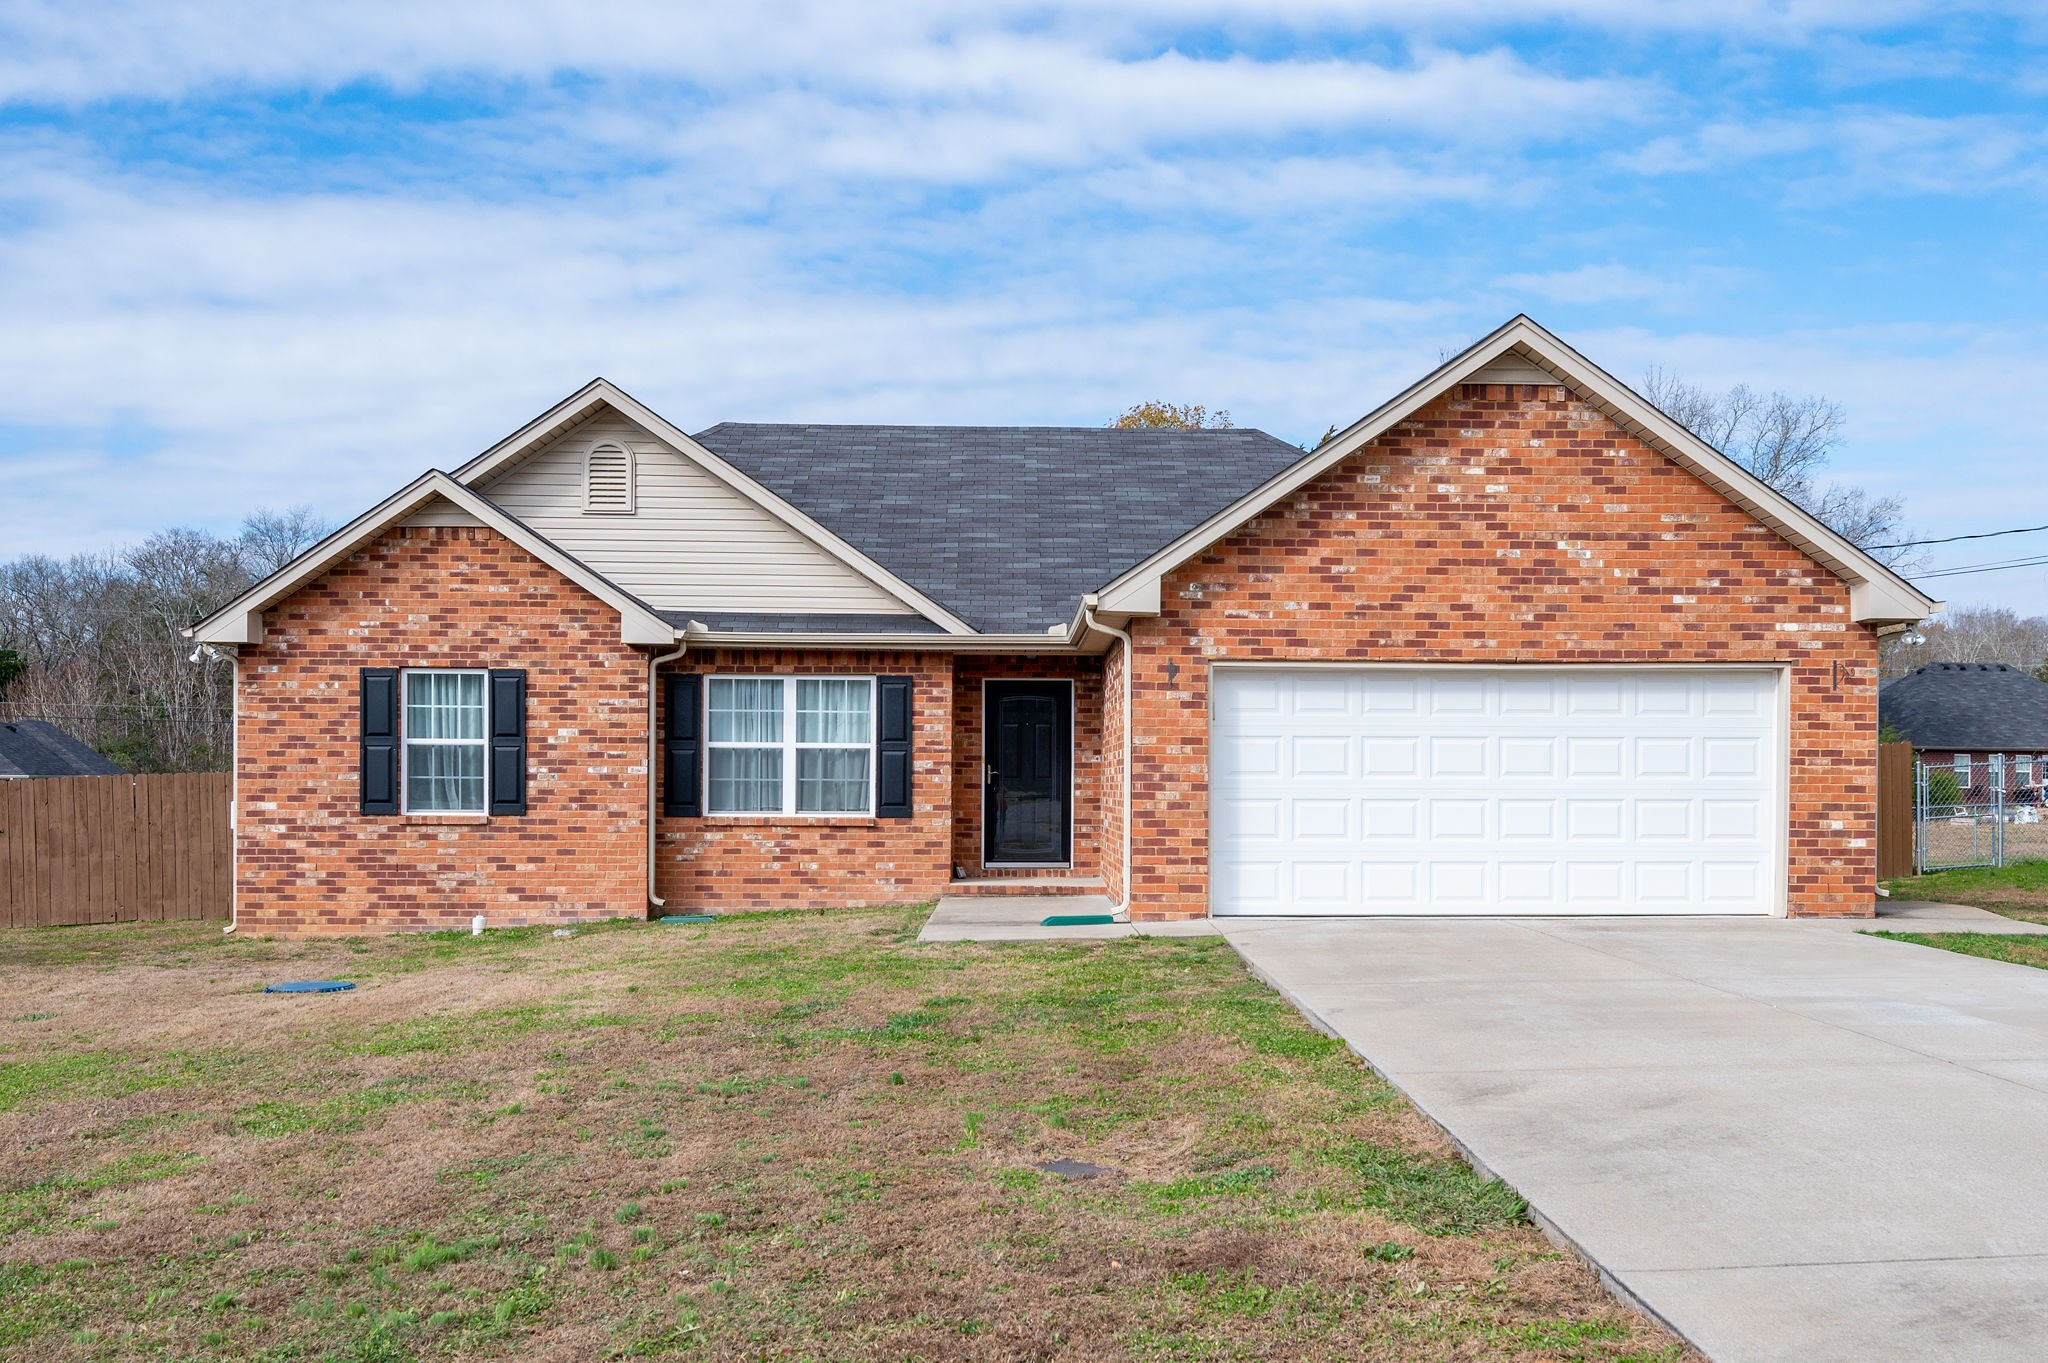 3310 Barretts Ridge Dr Property Photo - Murfreesboro, TN real estate listing